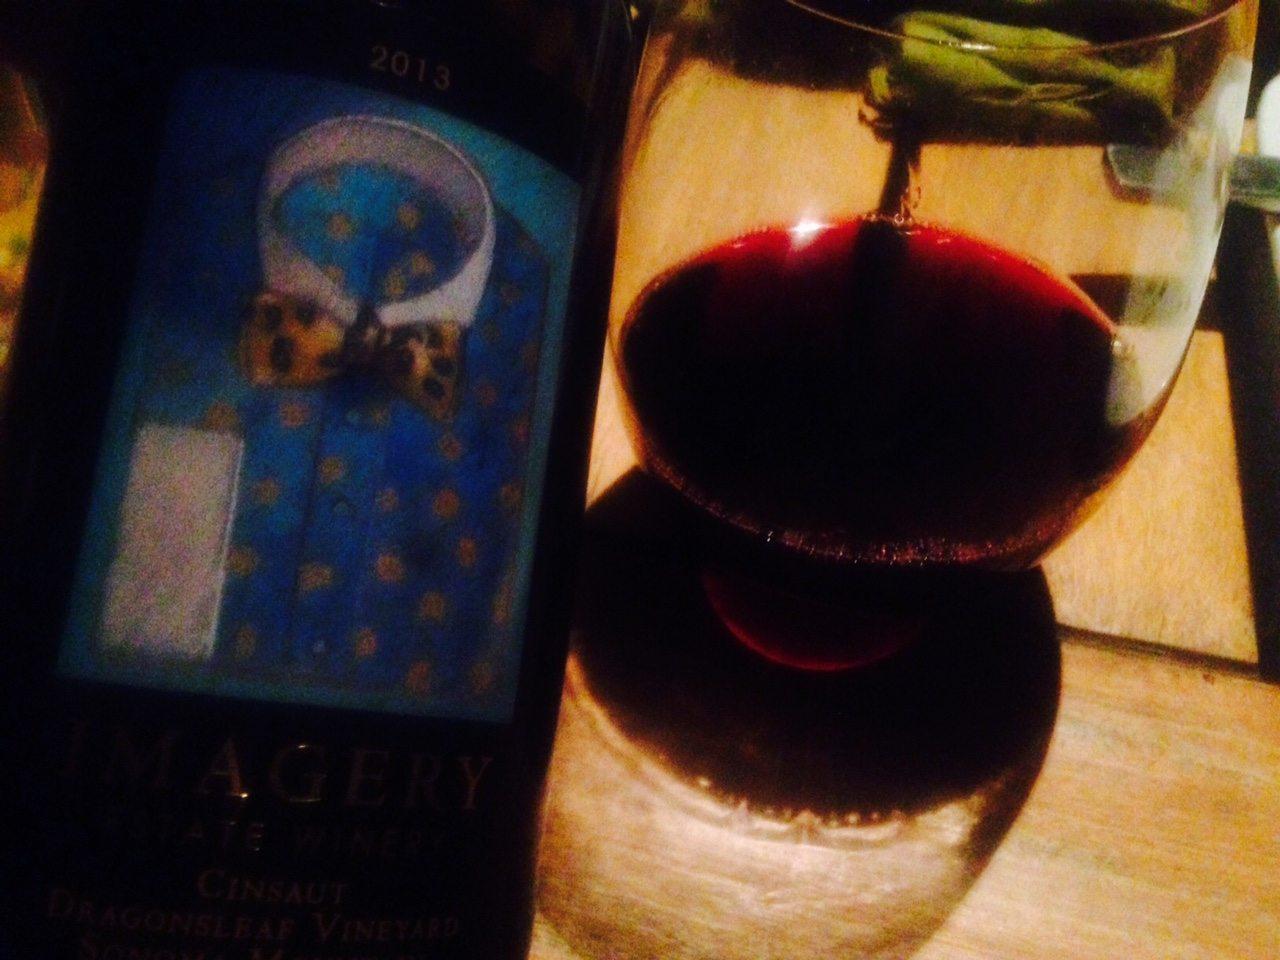 toronto-chefs-restaurants-consumed-bob-blumer-food-network-surreal-gourmet-wine